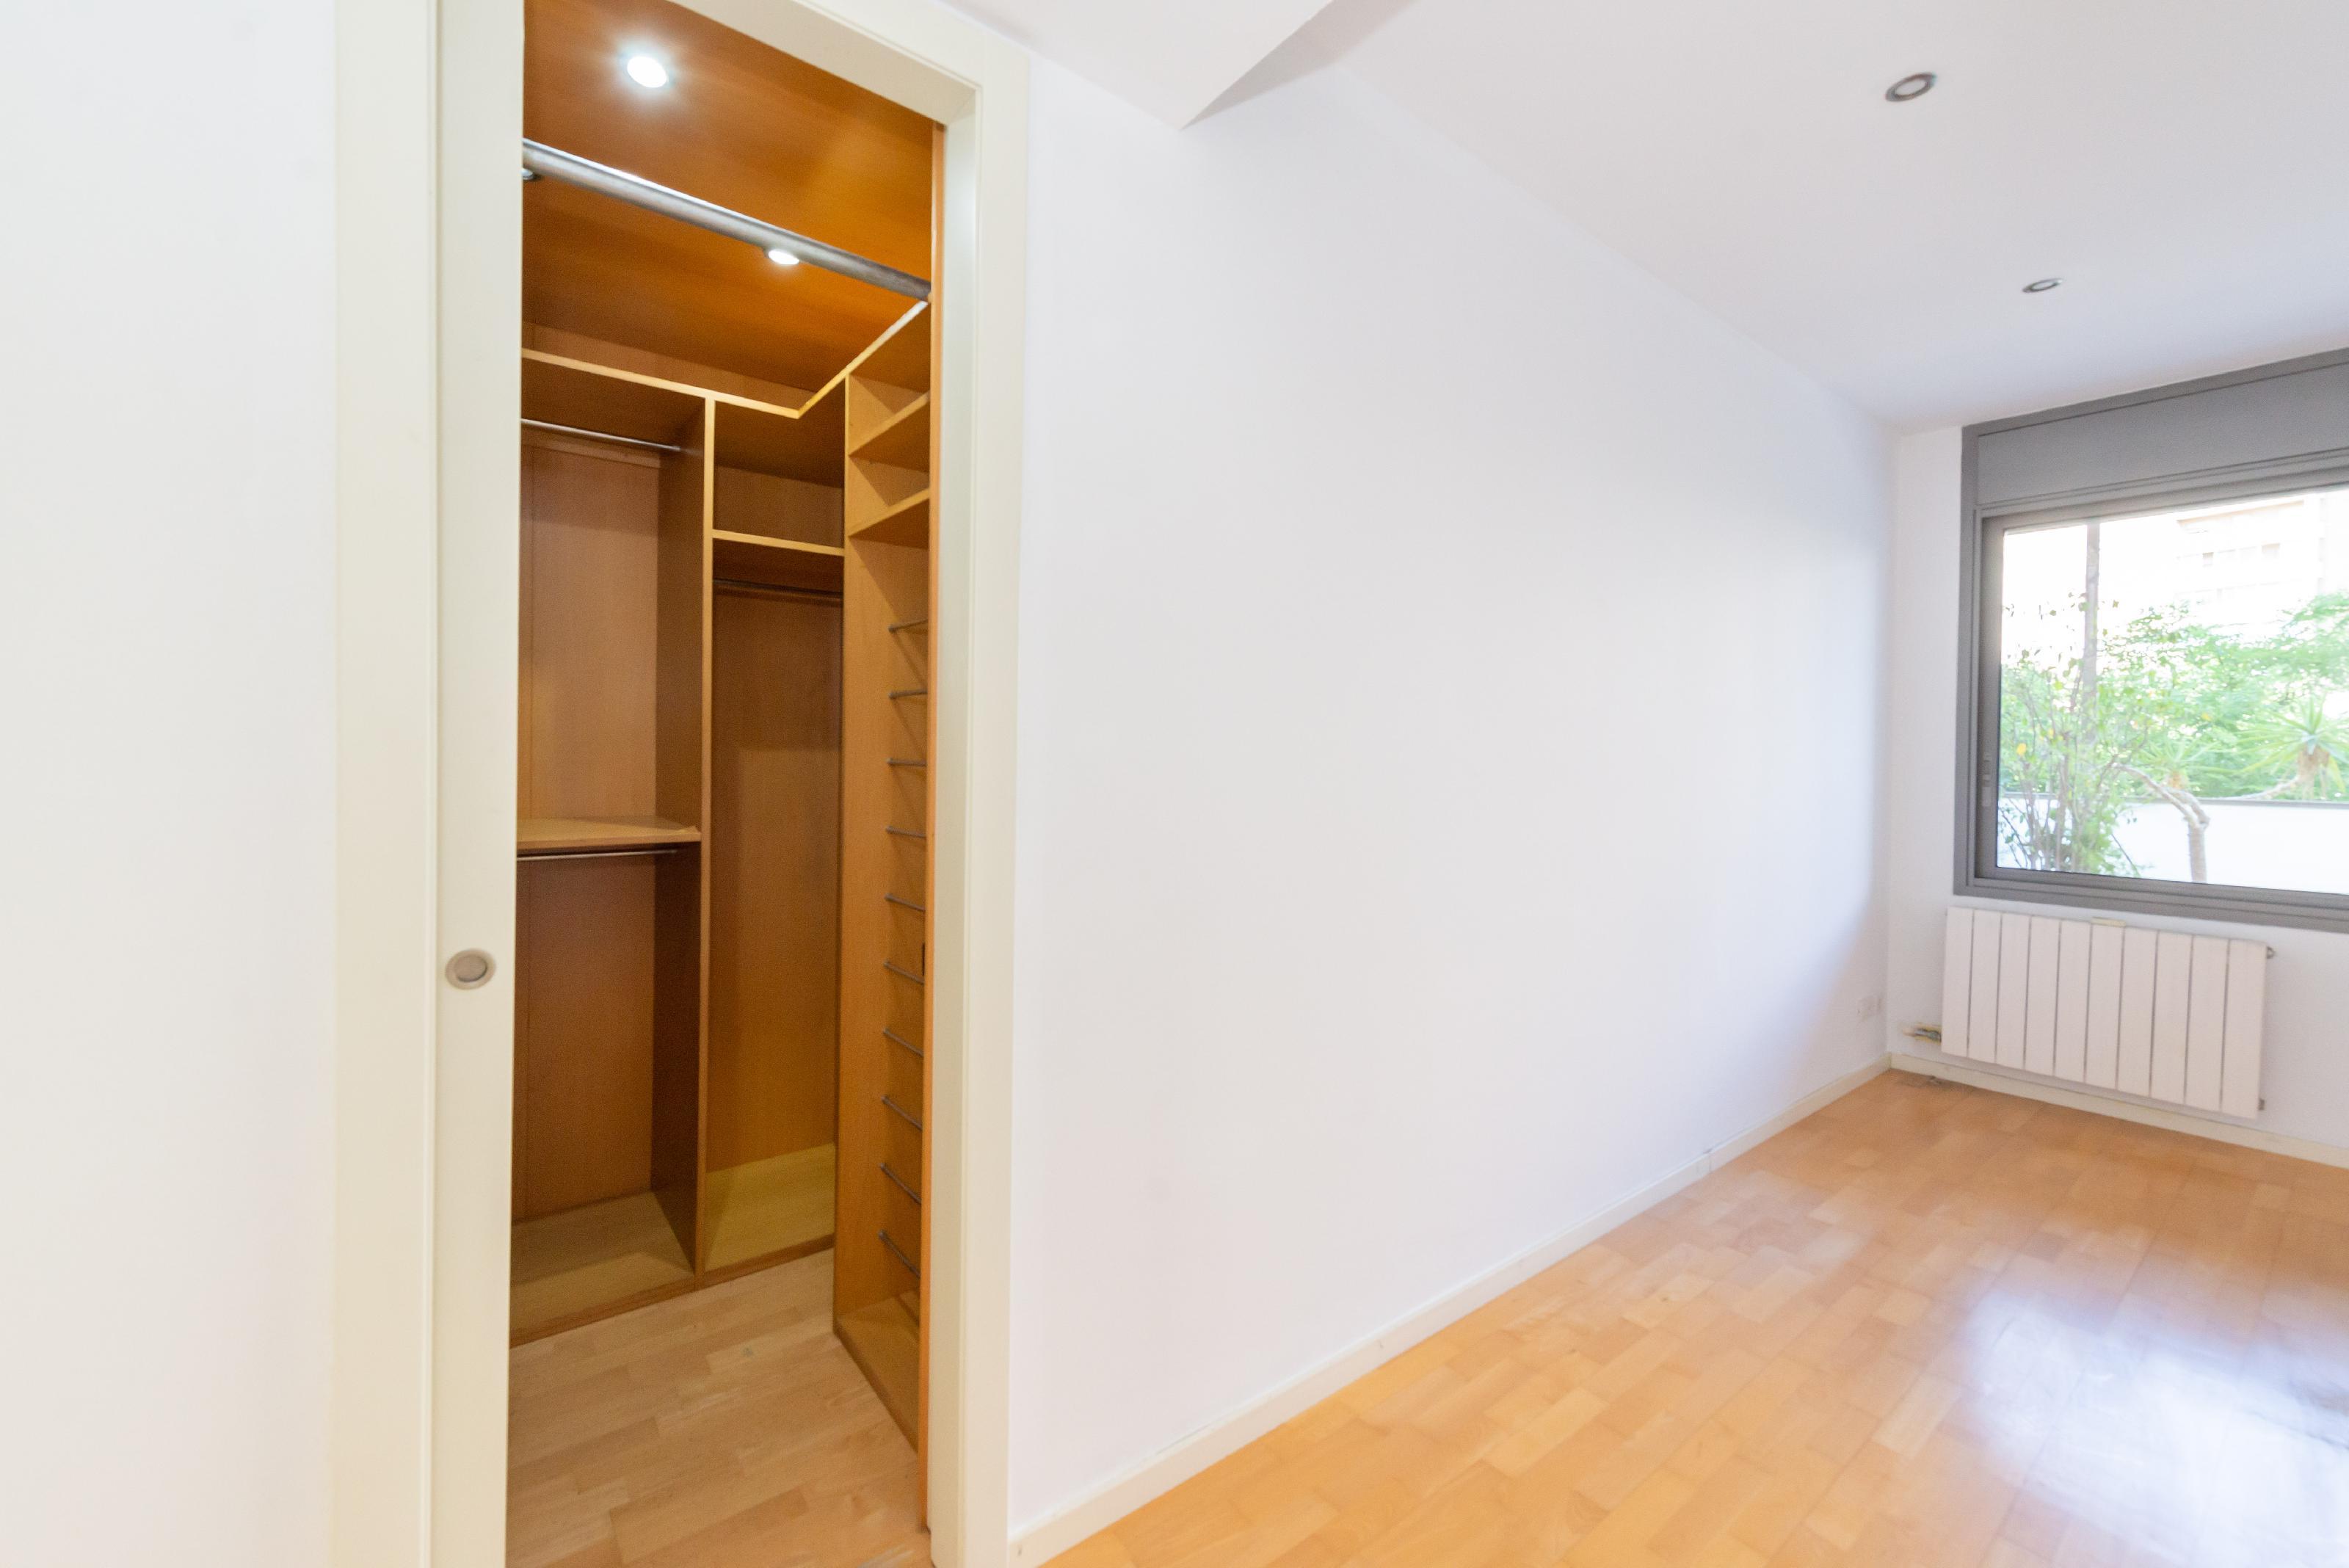 251446 Flat for sale in Sarrià-Sant Gervasi, Tres Torres 24